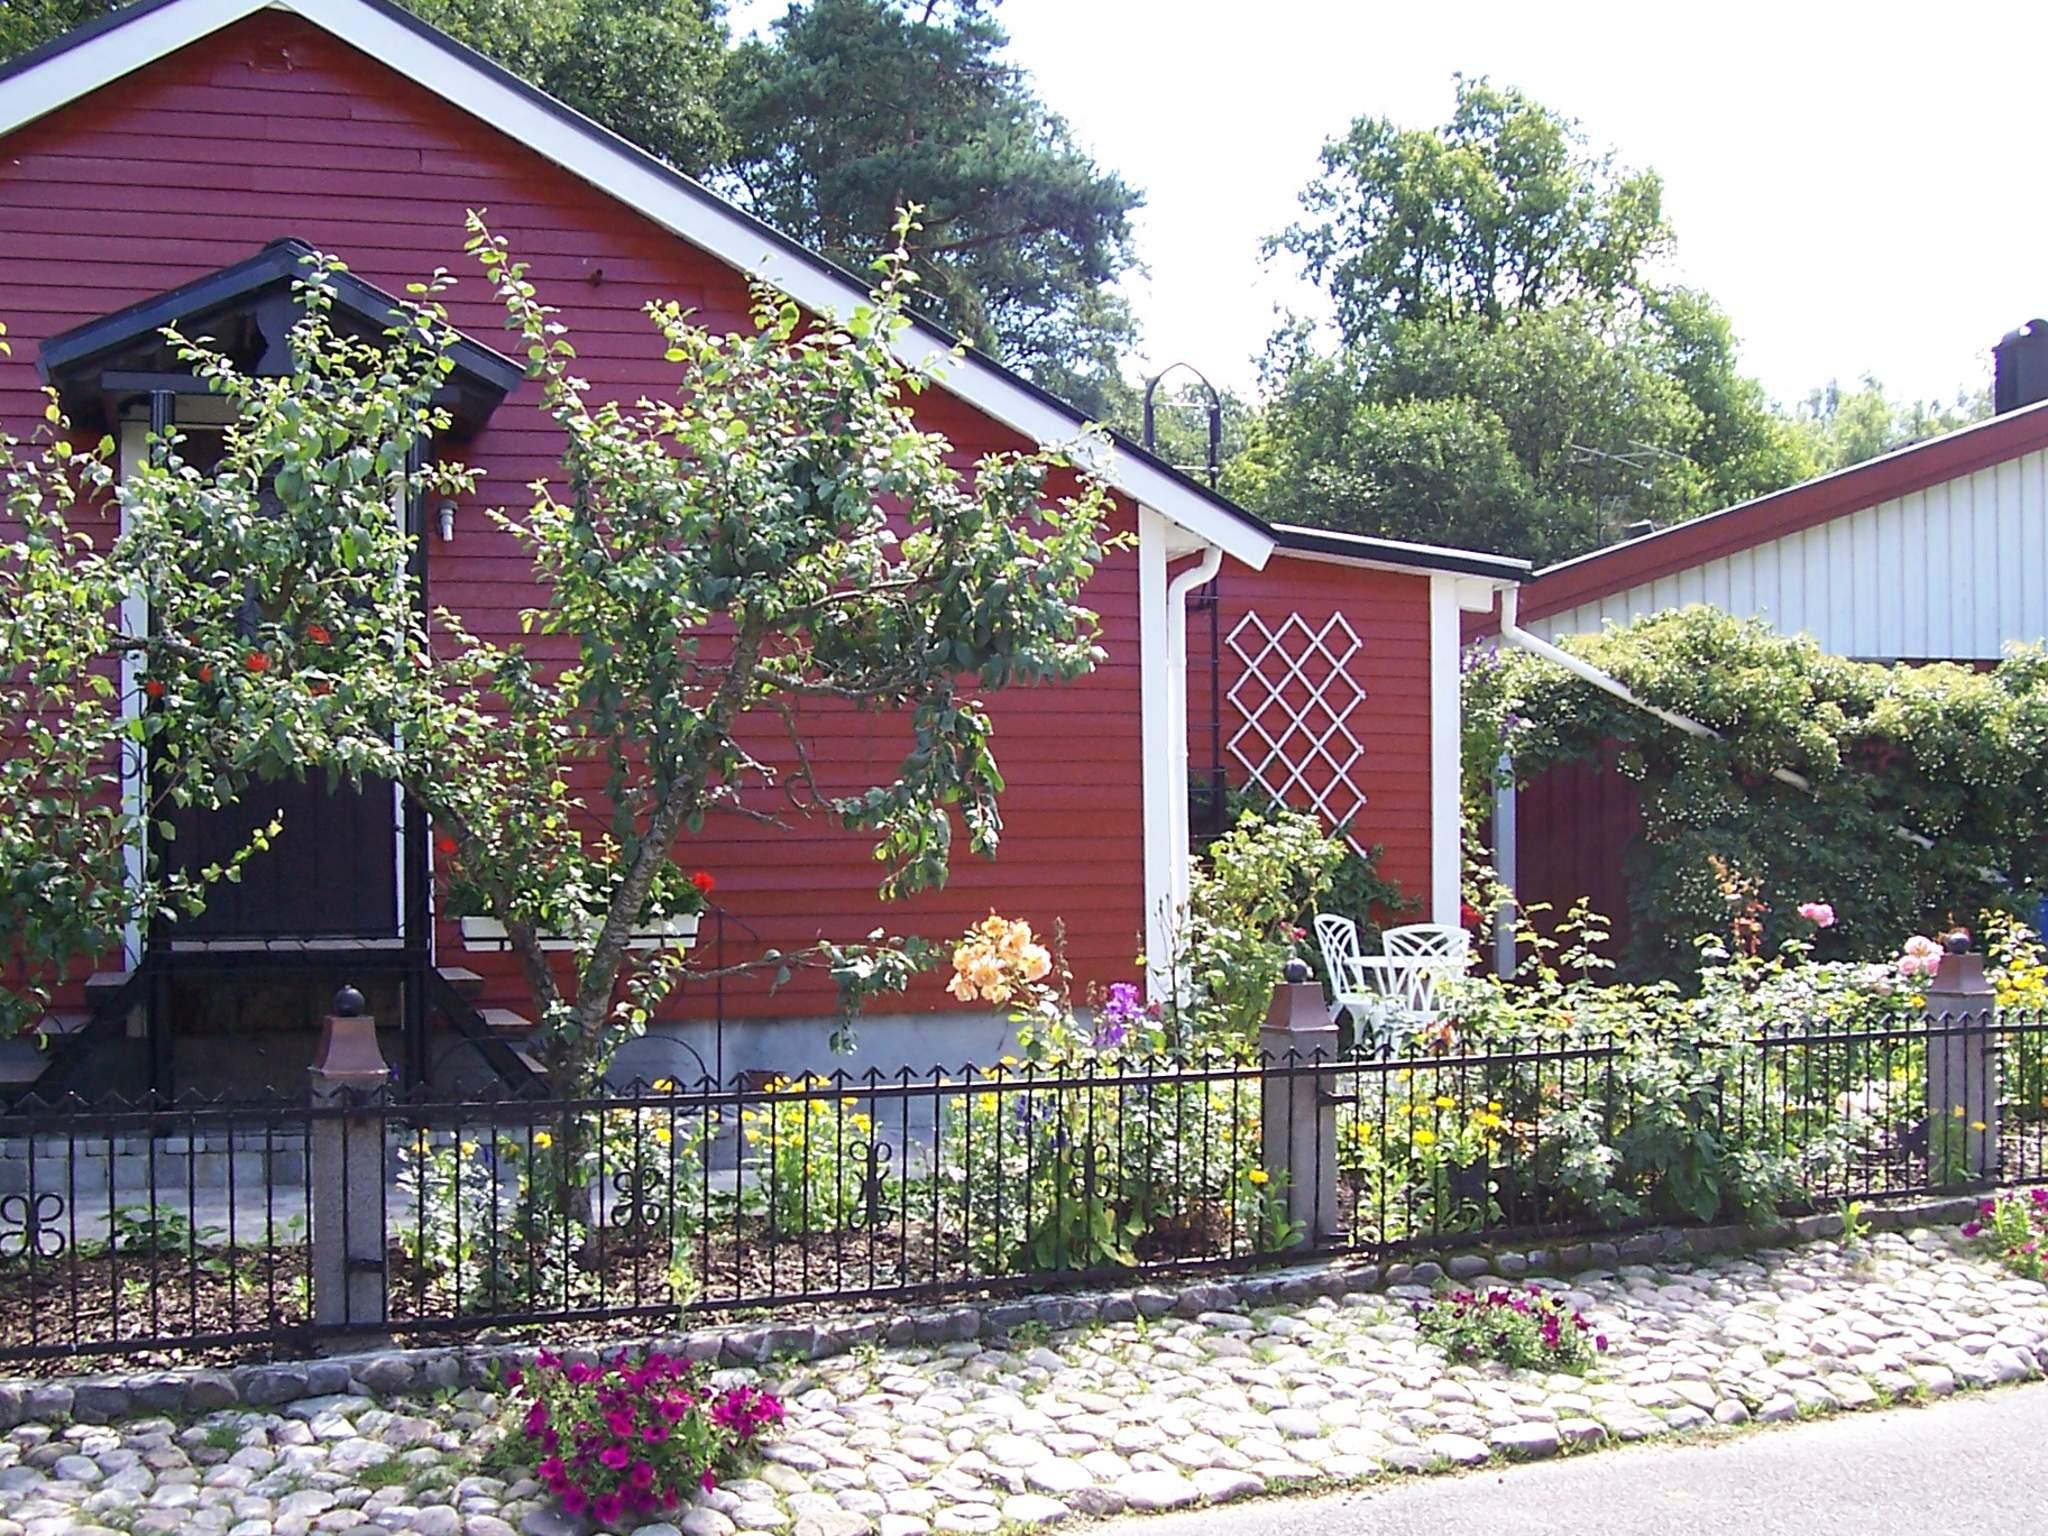 Ferienhaus Finjasjön (86936), Hässleholm, Skane län, Südschweden, Schweden, Bild 10